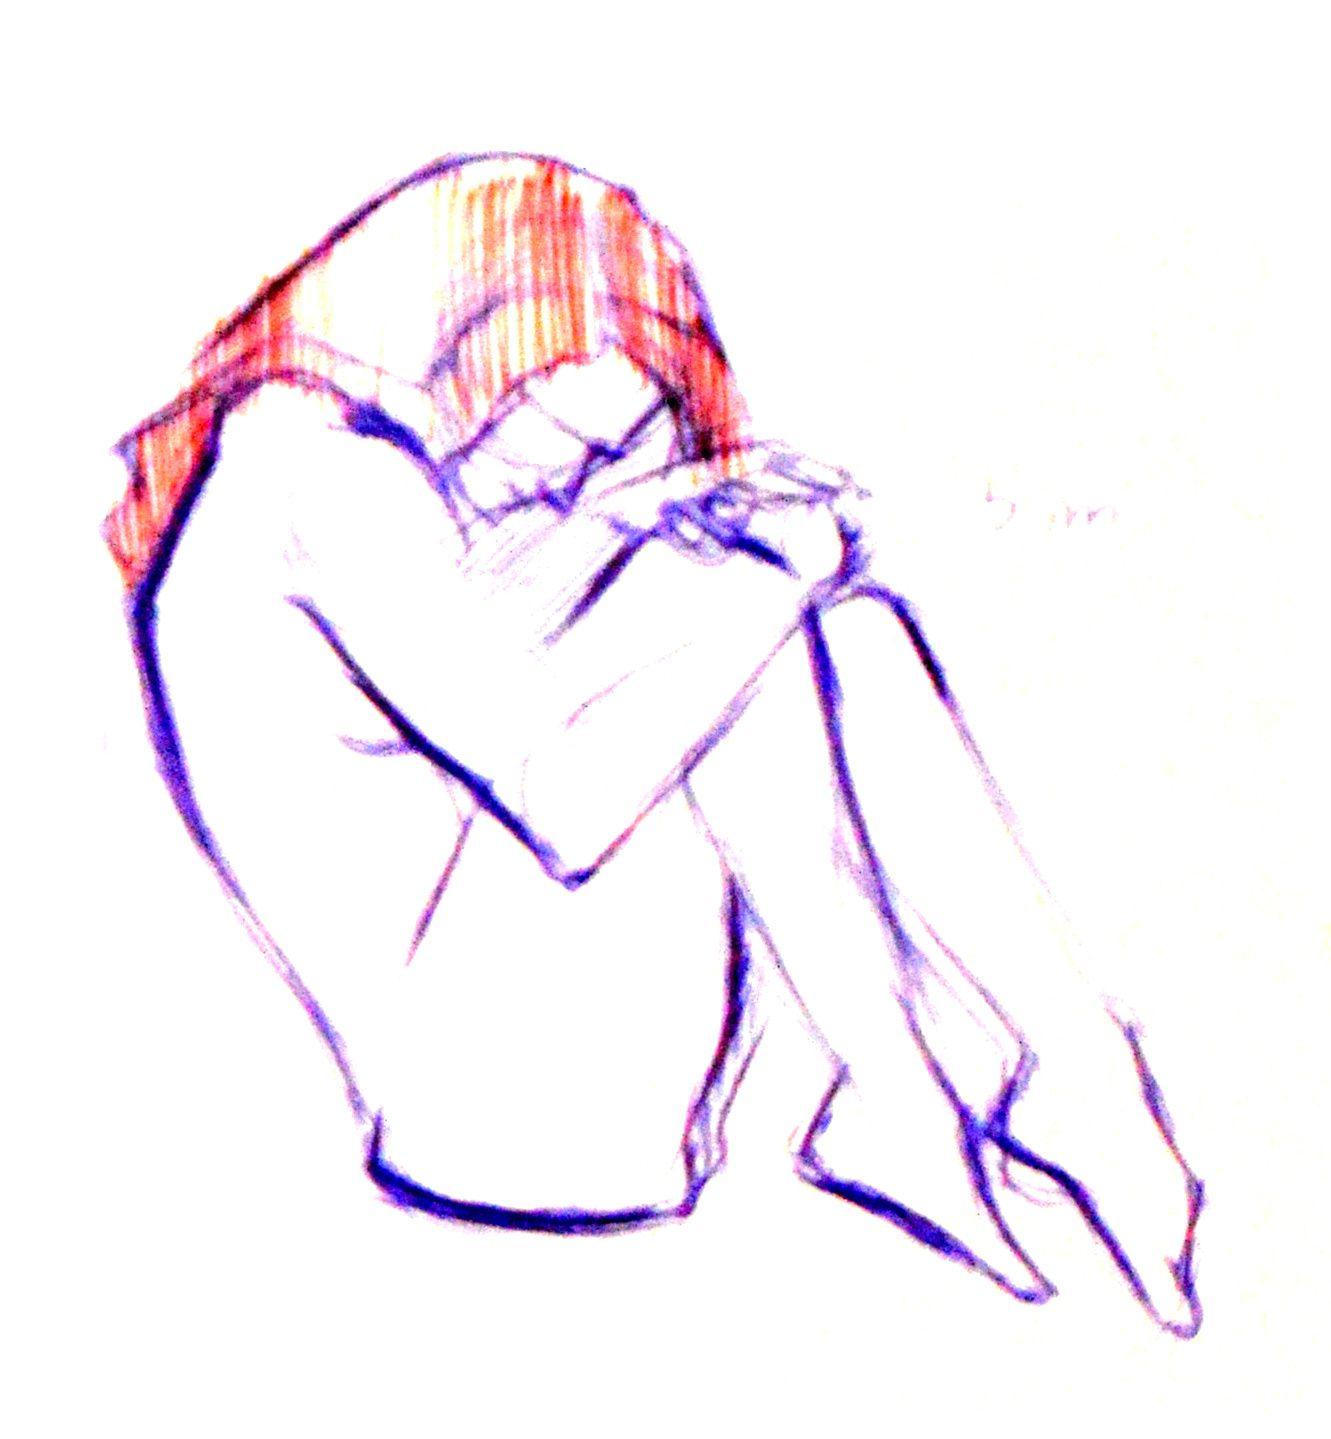 Feel Good - Source : http://artists.pixelovely.com